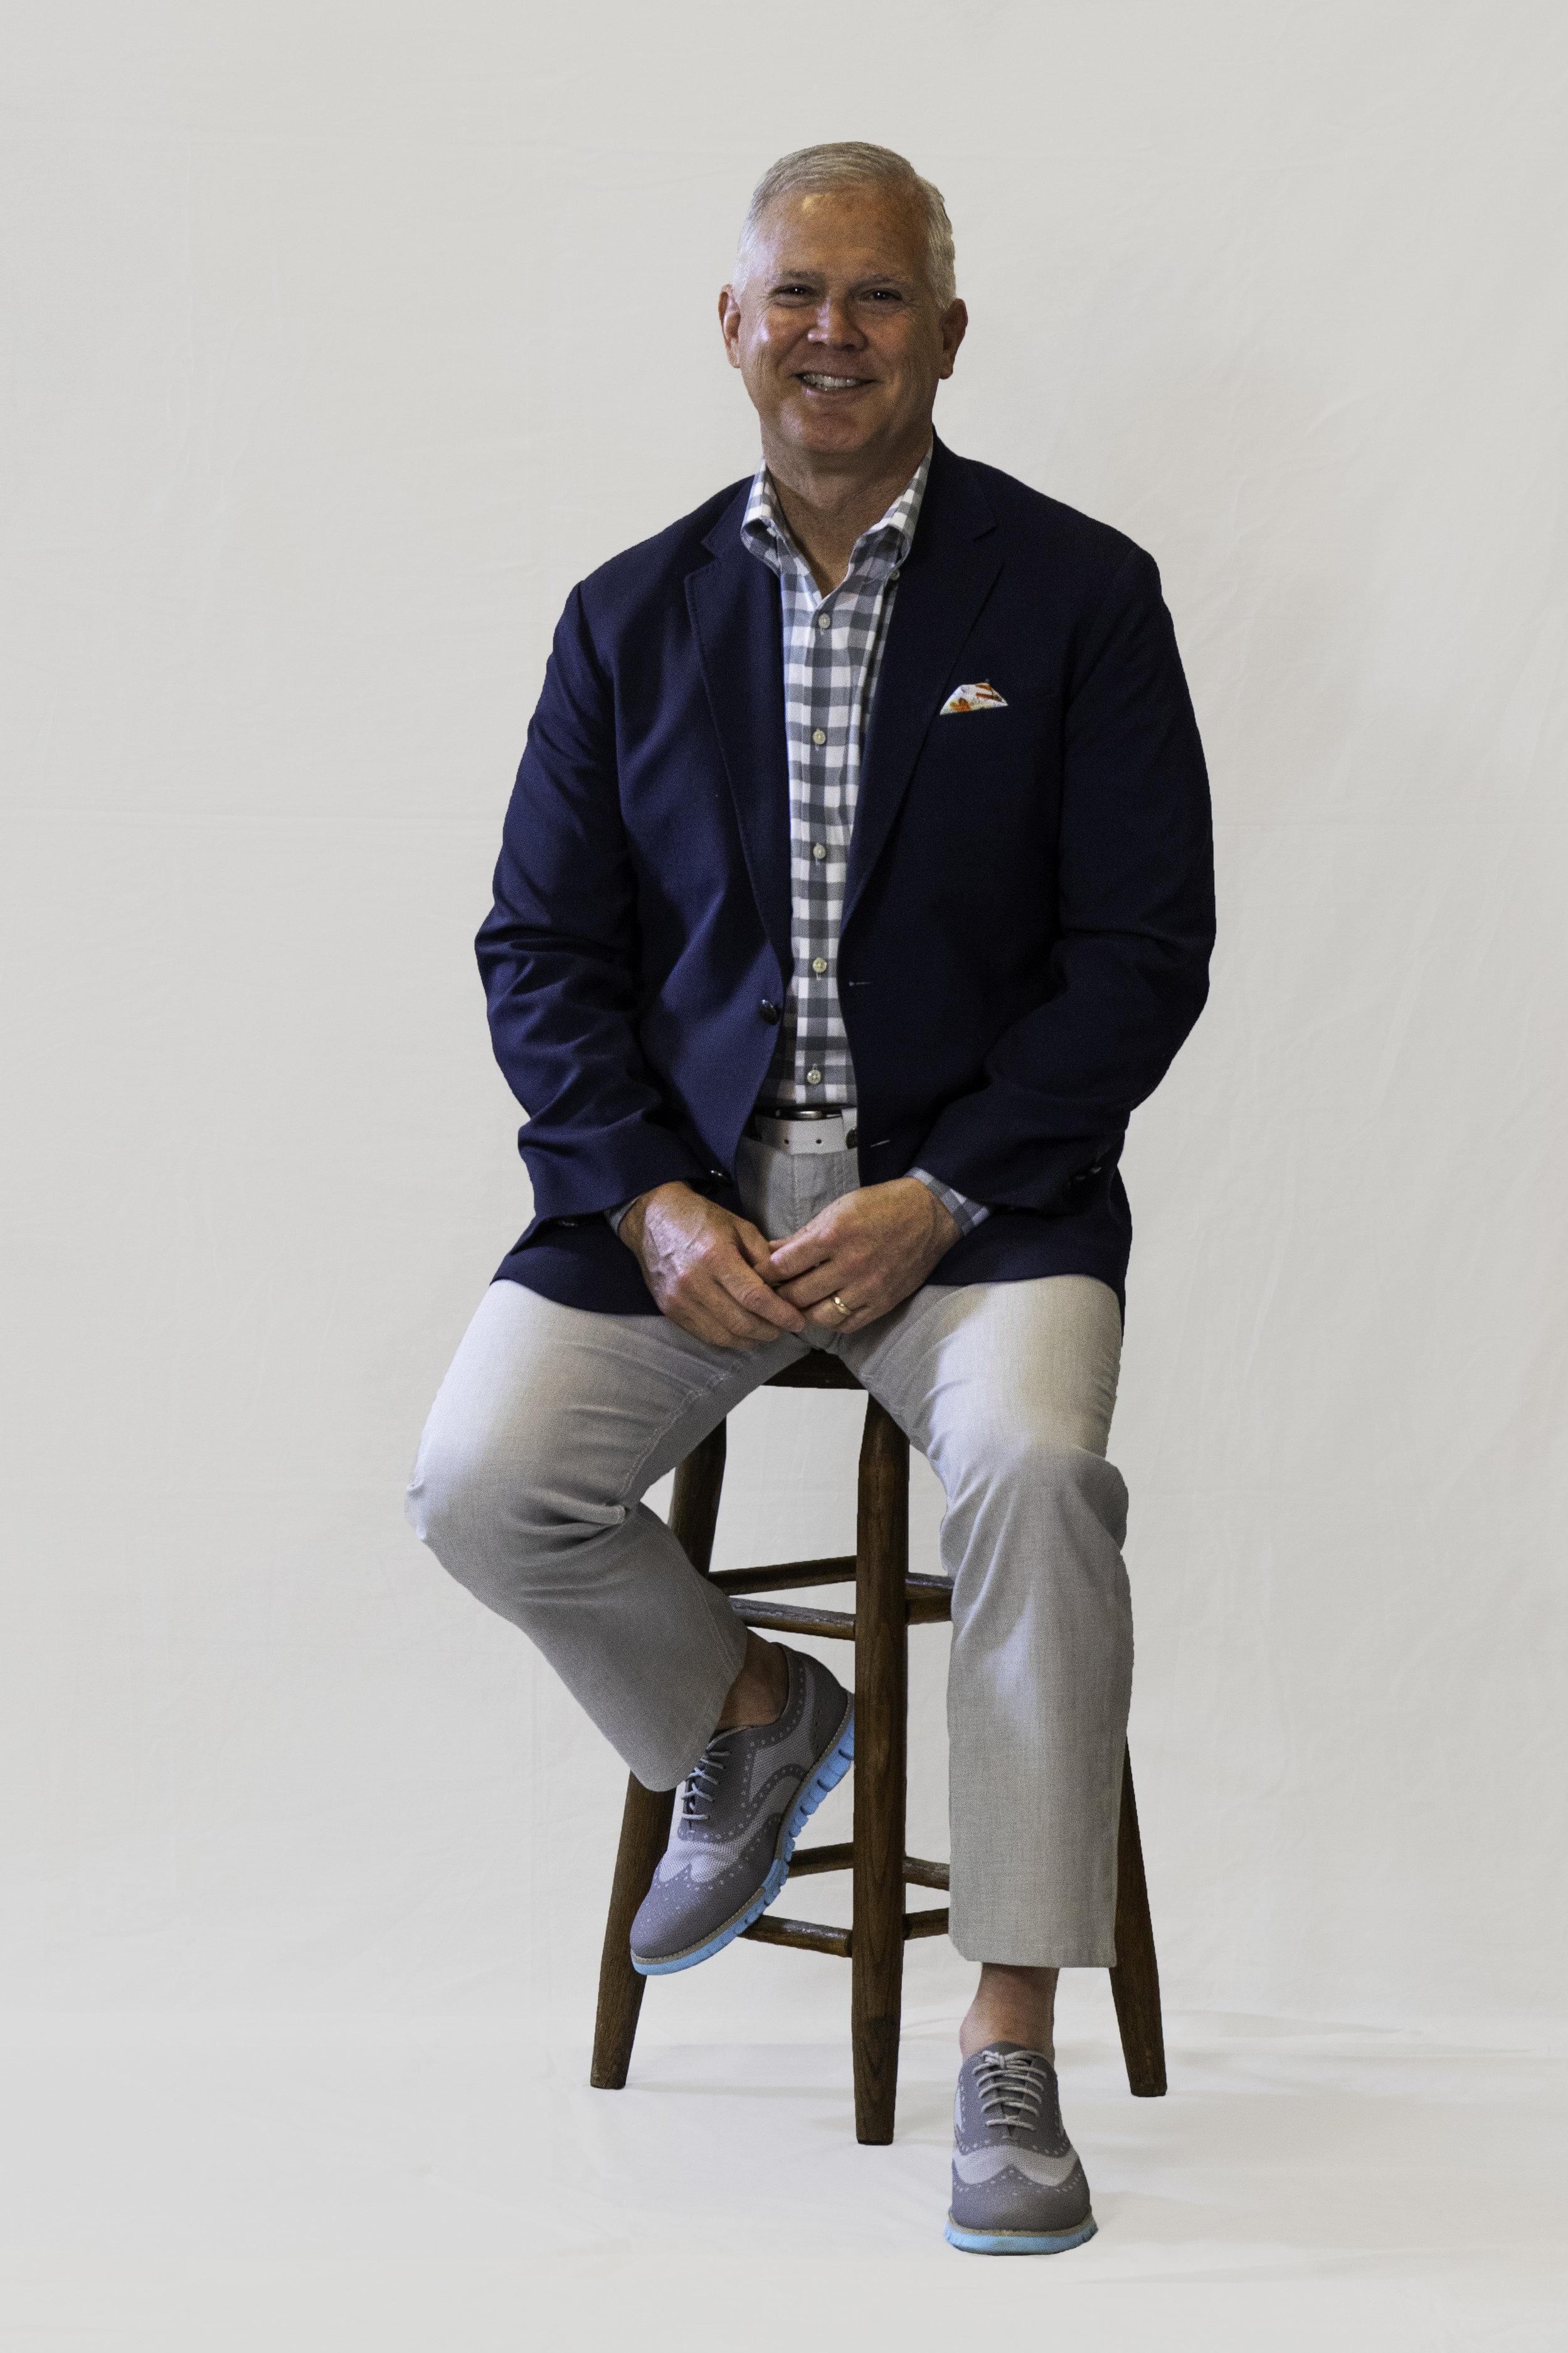 Jeff Neuber - Managing Partner